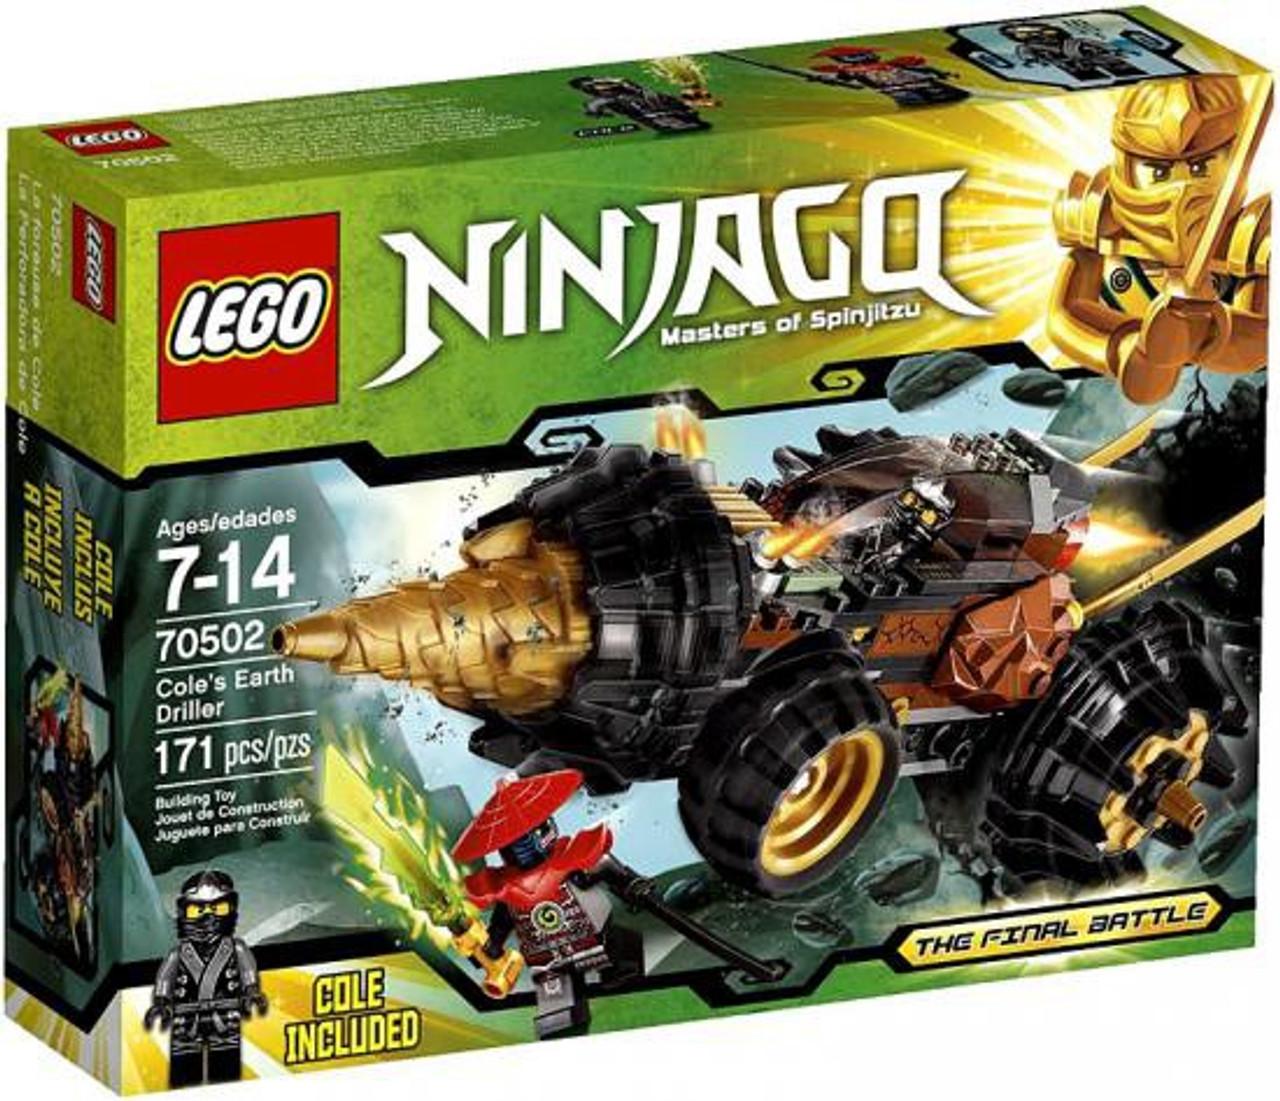 LEGO Ninjago The Final Battle Cole's Earth Driller Set #70502